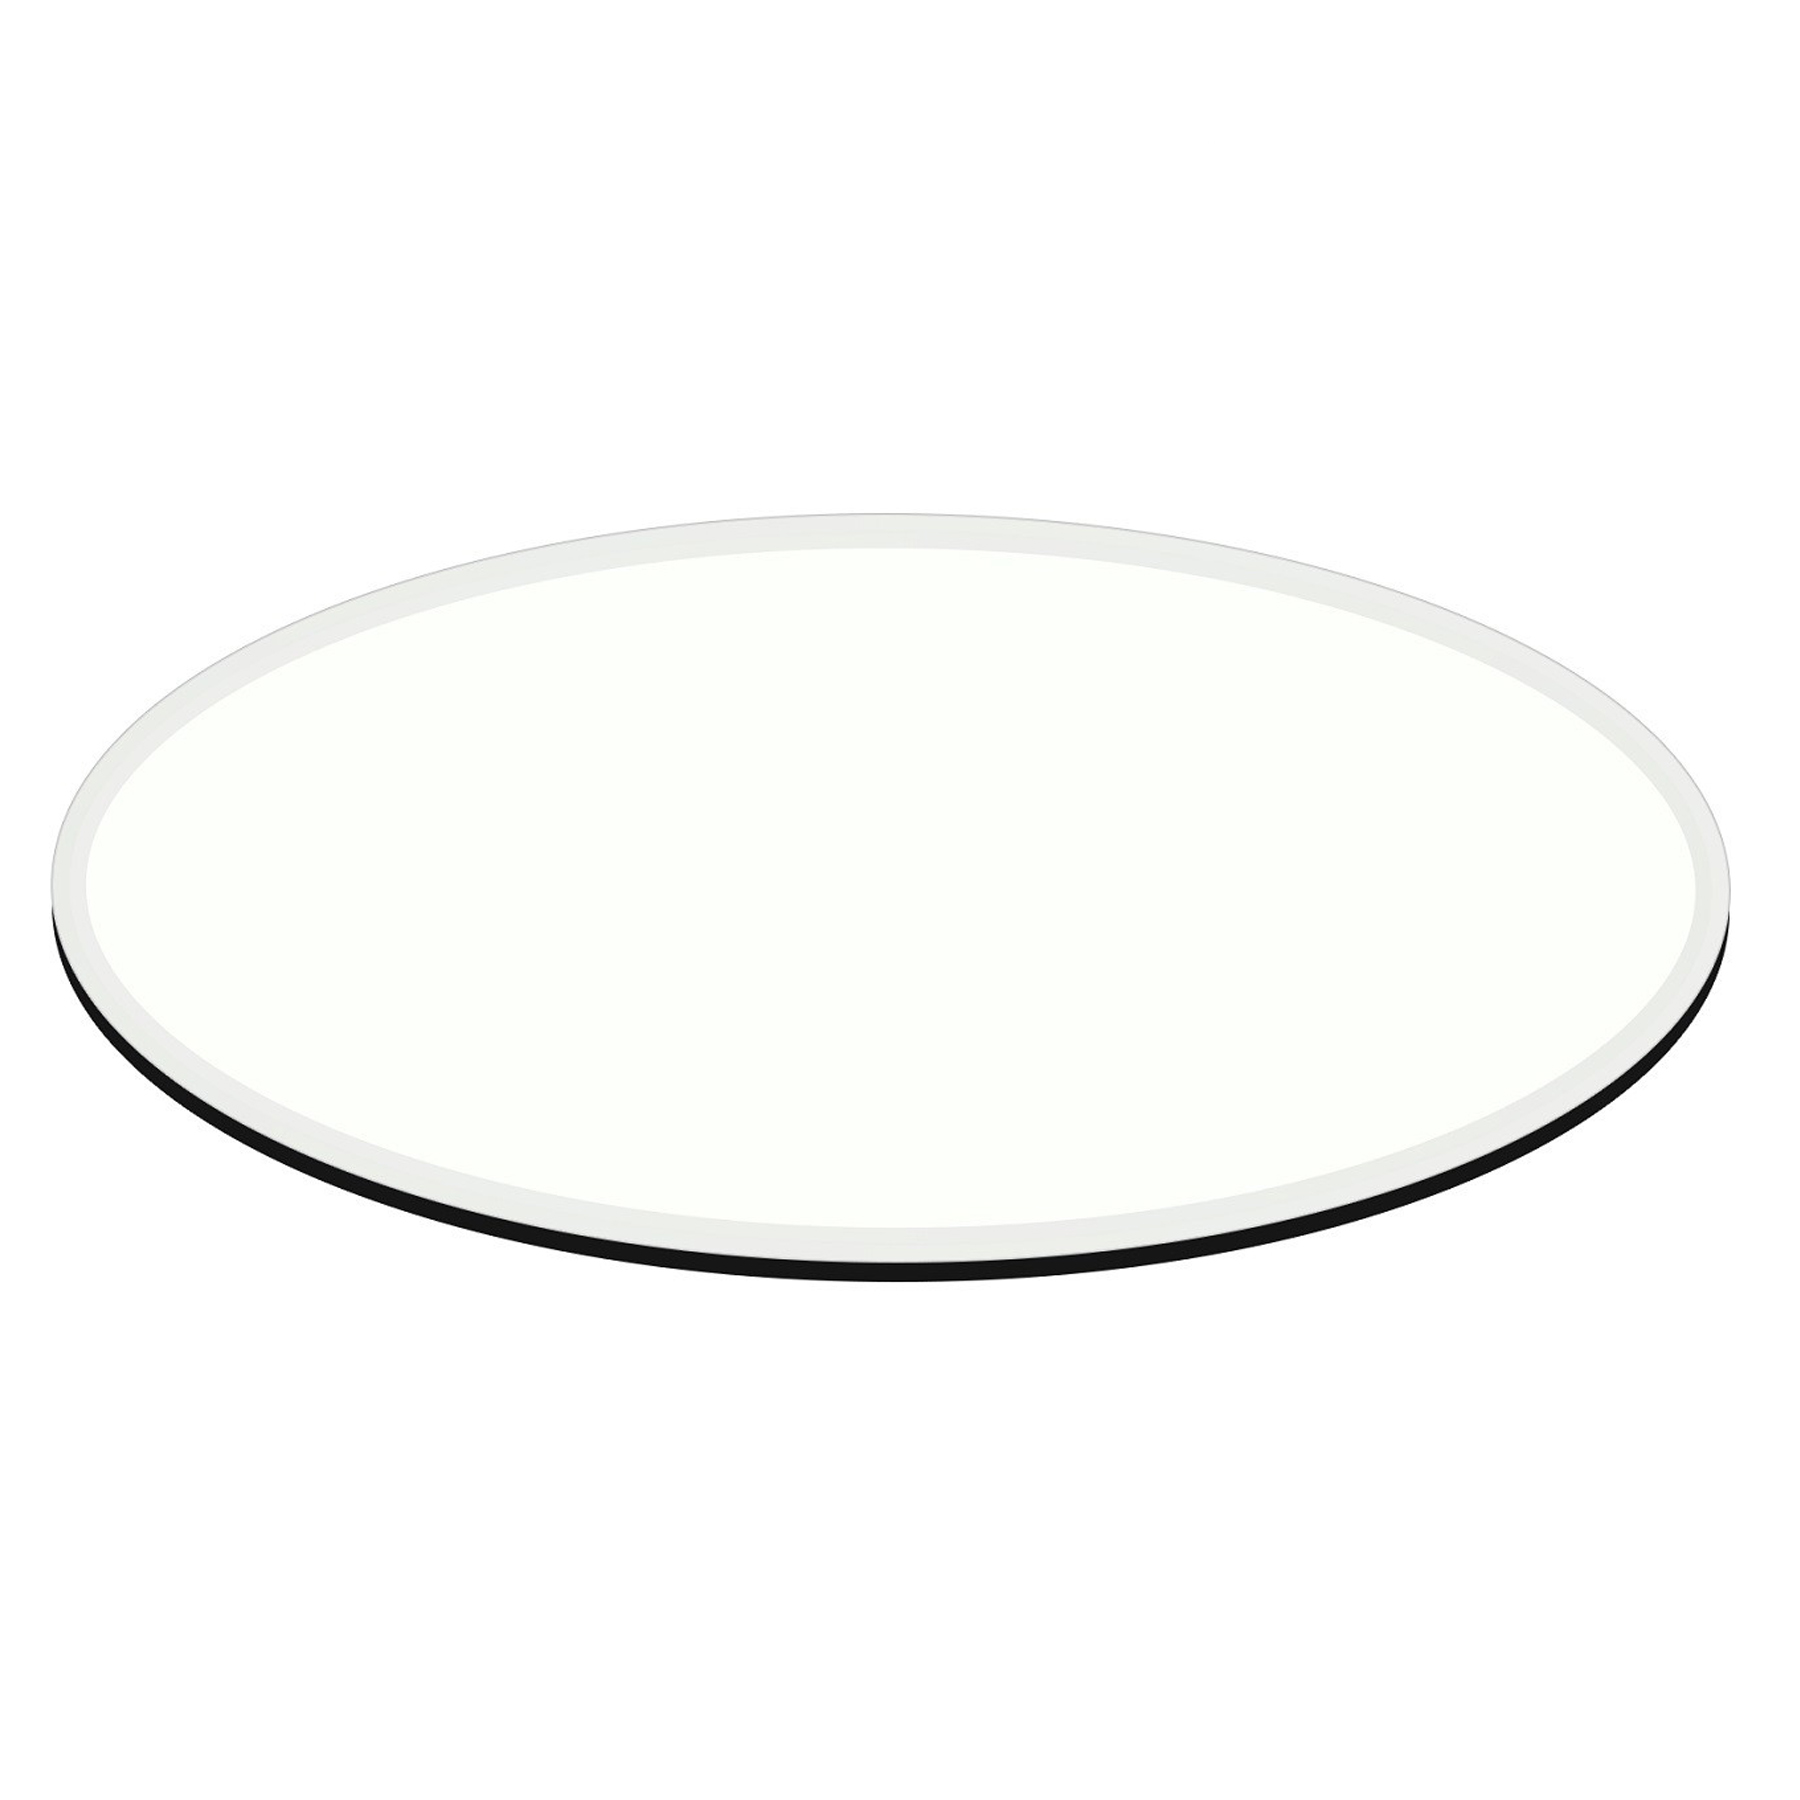 E Oval Egg Glass Table Top 1 2